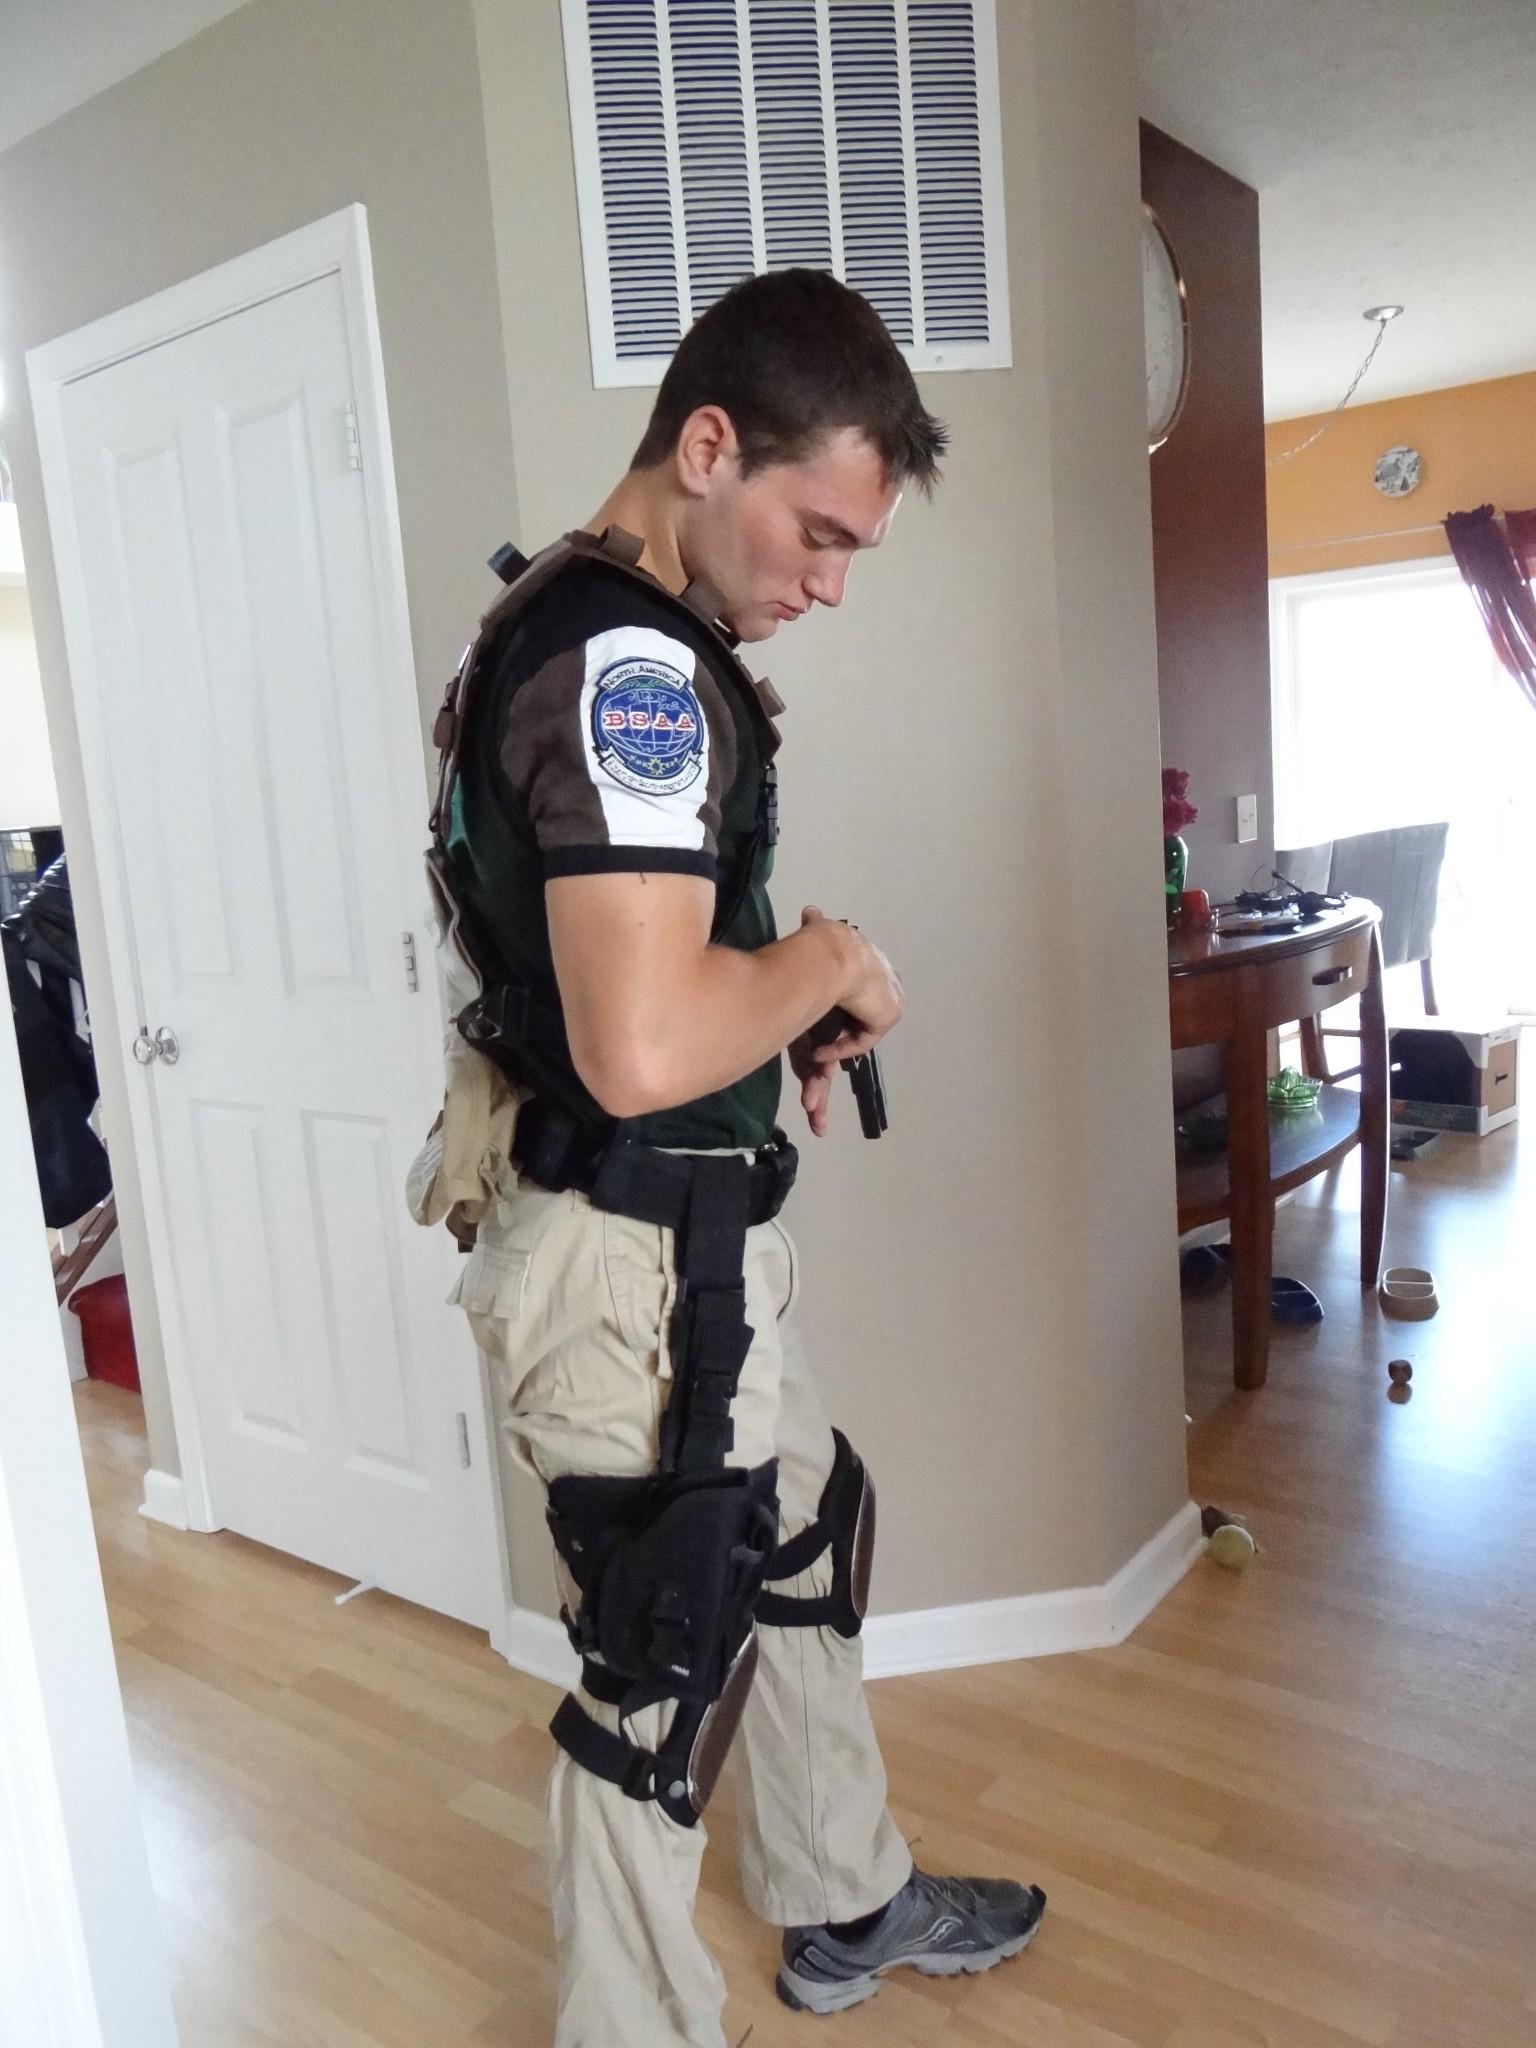 Chris Redfield, Resident Evil – Cosplay4UsAll | 1536 x 2048 jpeg 526kB